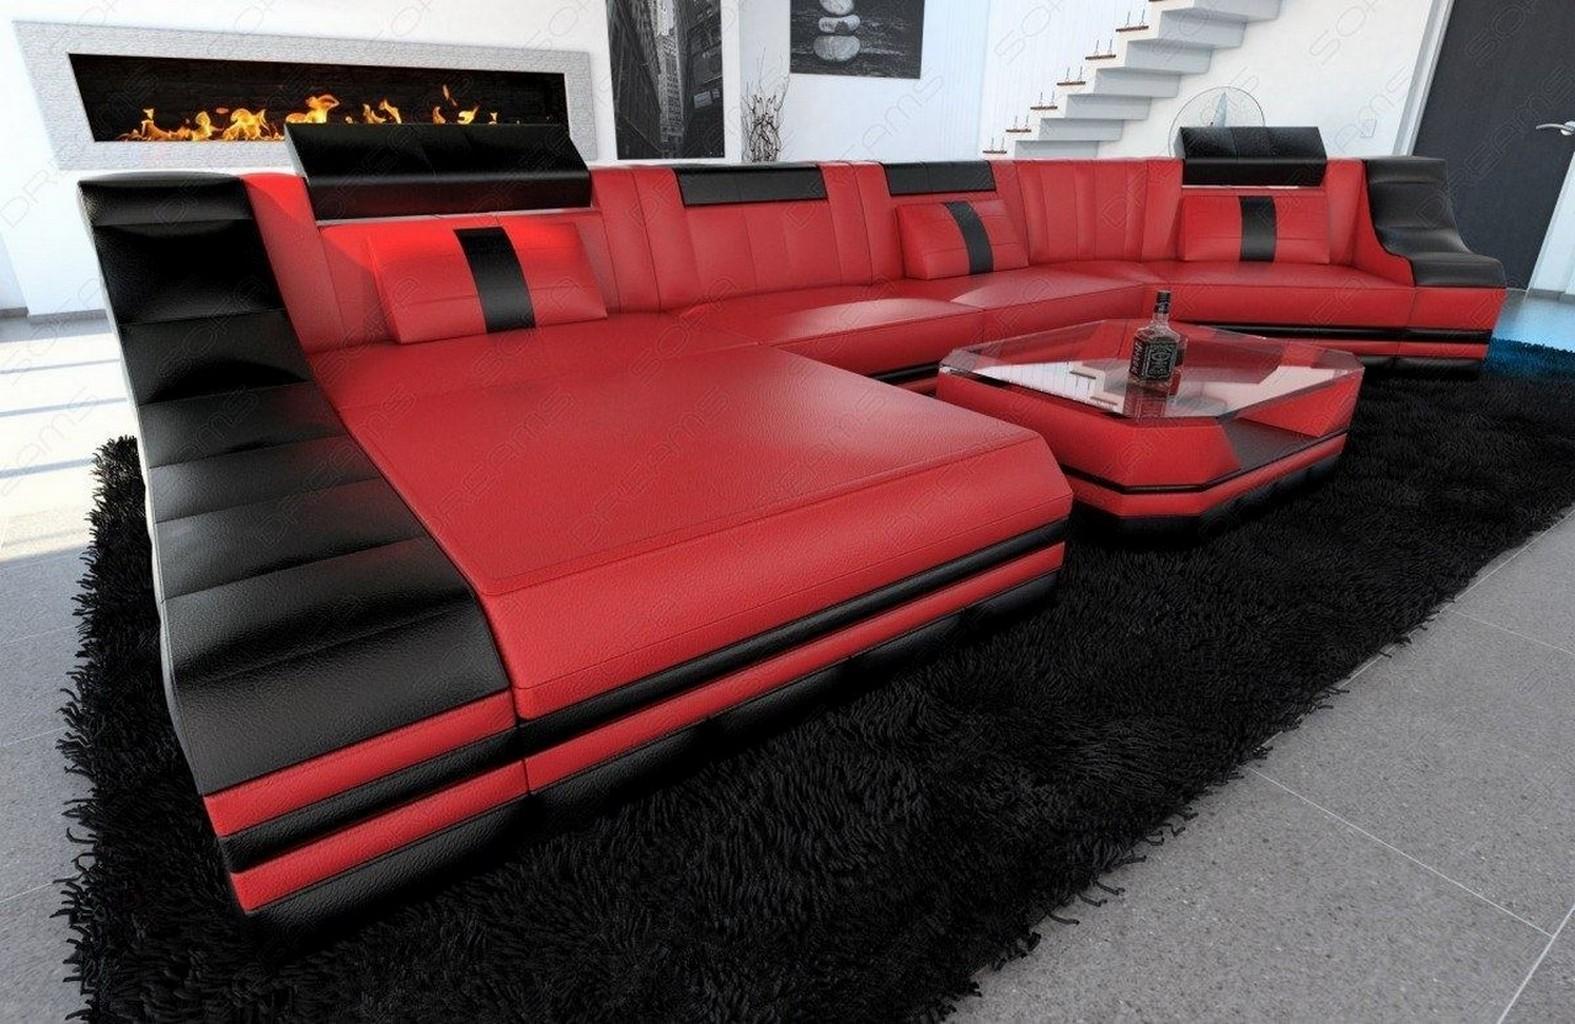 Ledercouch turino c form led beleuchtung designer couch for Wohnlandschaft rot schwarz